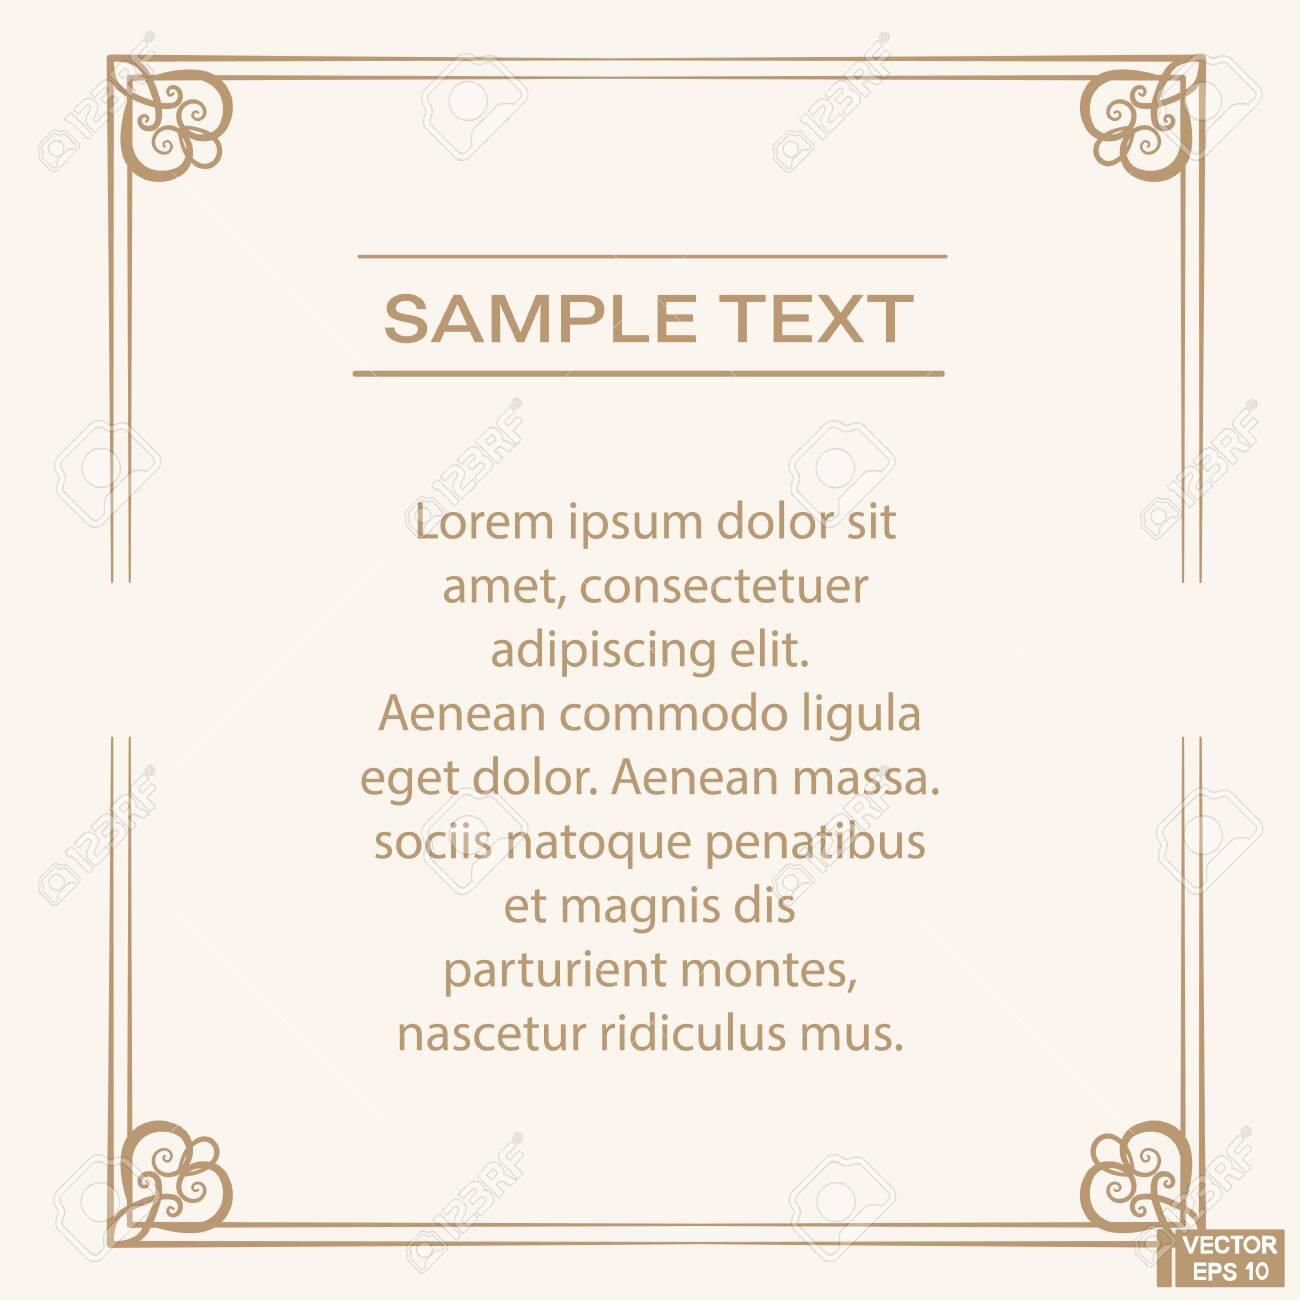 Vector image. Vintage baroque frame. Acanthus foliage swirl decorative design element. Scroll ornament engraving border floral. retro pattern antique style. - 136526845